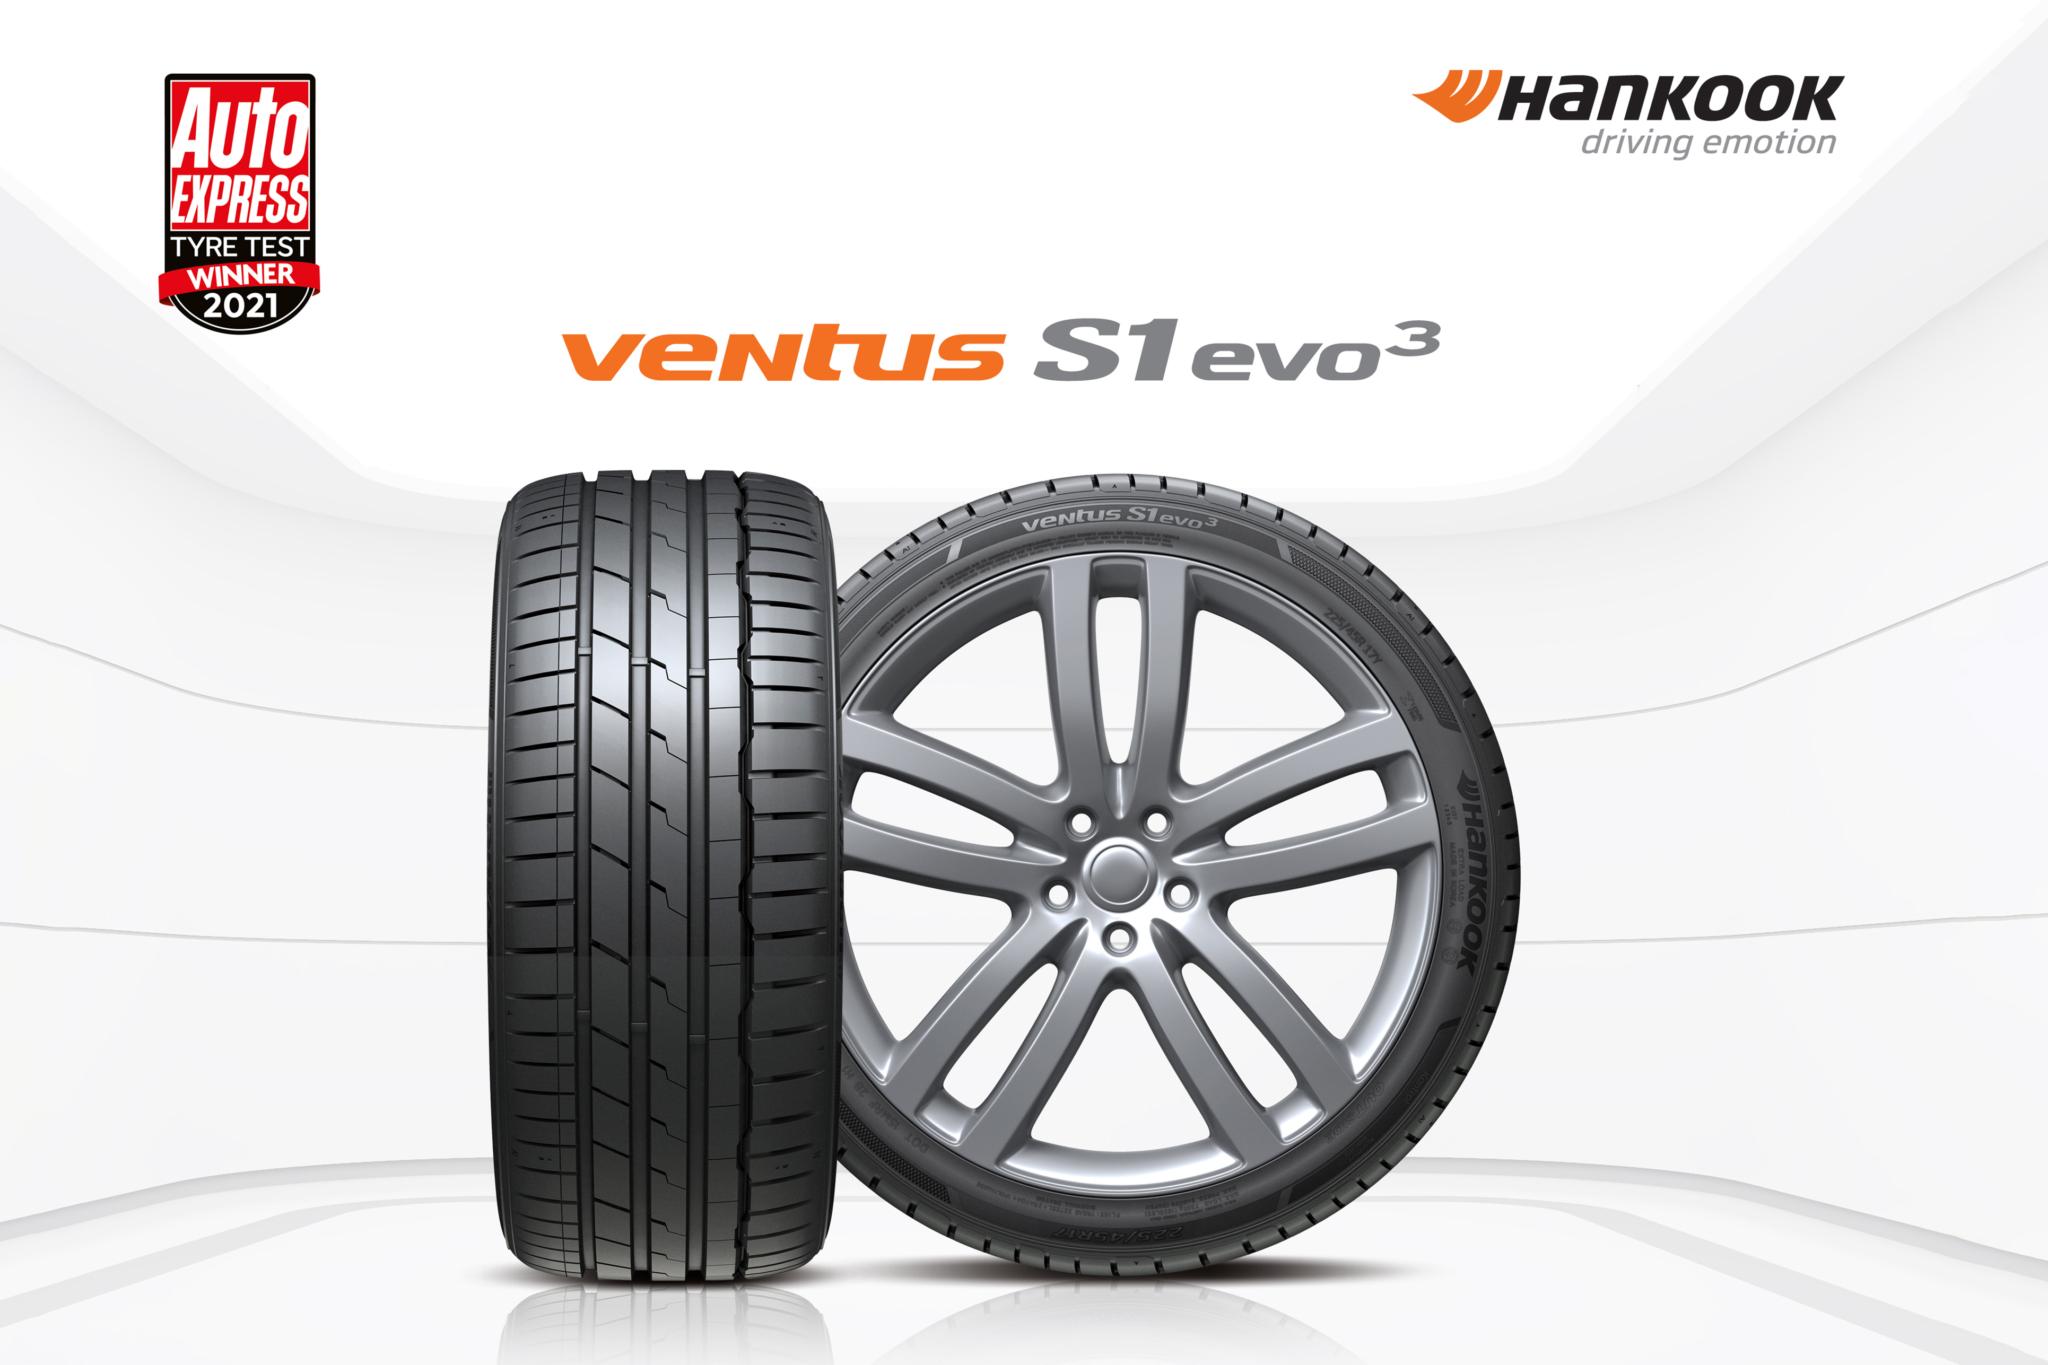 Hankook Ventus S1 evo 3 wins Auto Express 2021 Summer Tyre Test